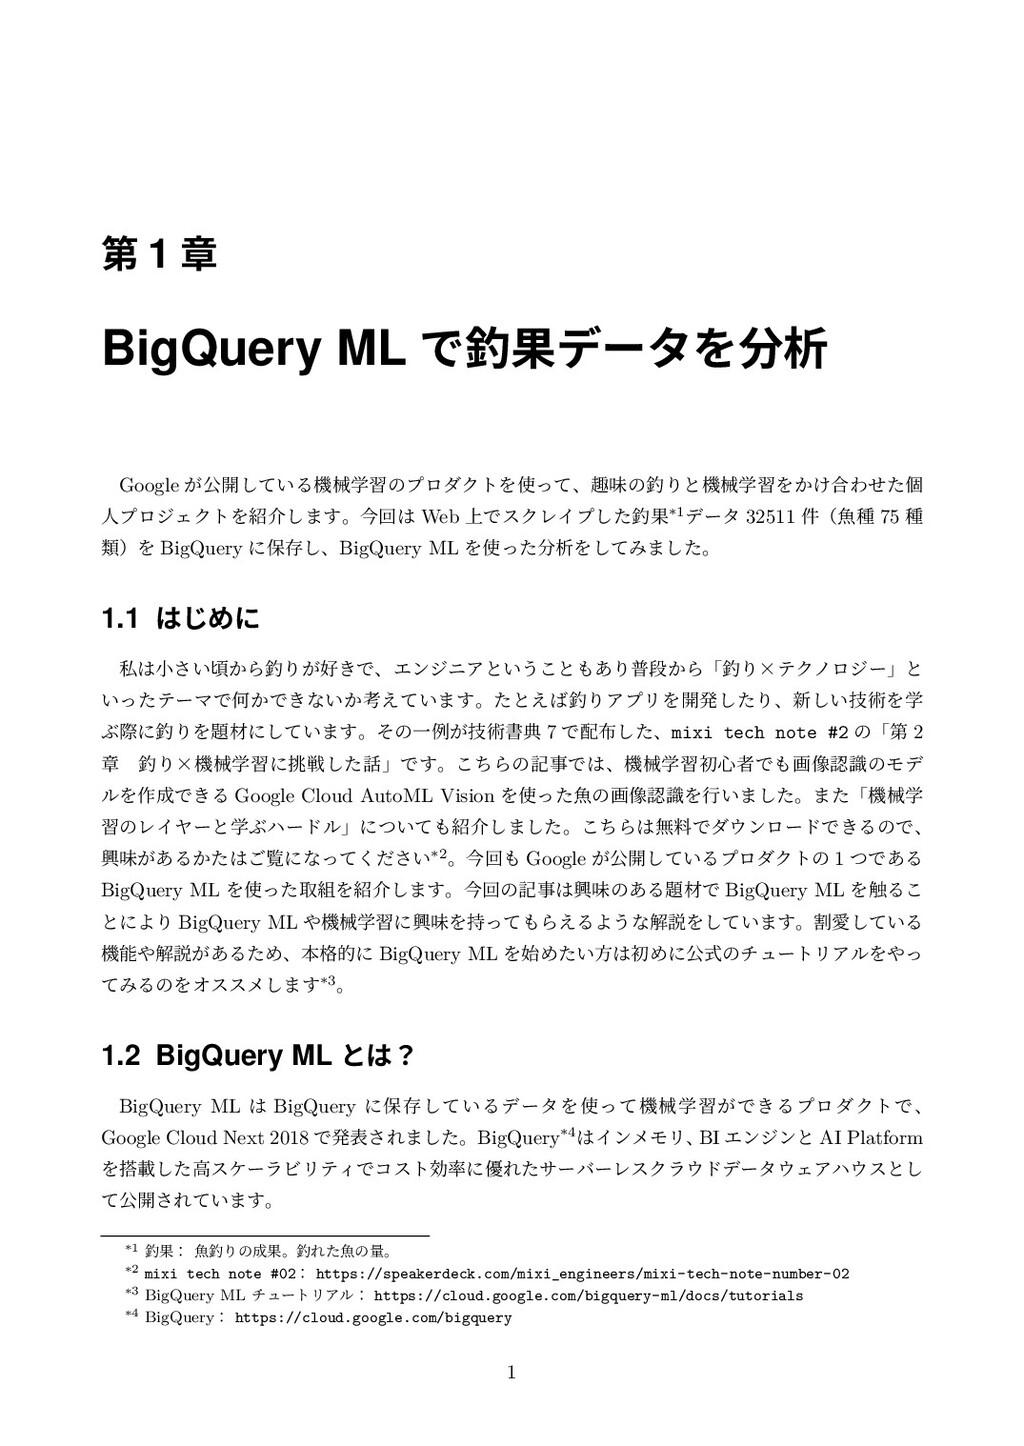 ୈ 1 ষ BigQuery ML ͰՌσʔλΛੳ Google ͕ެ։͍ͯ͠Δػցֶशͷ...